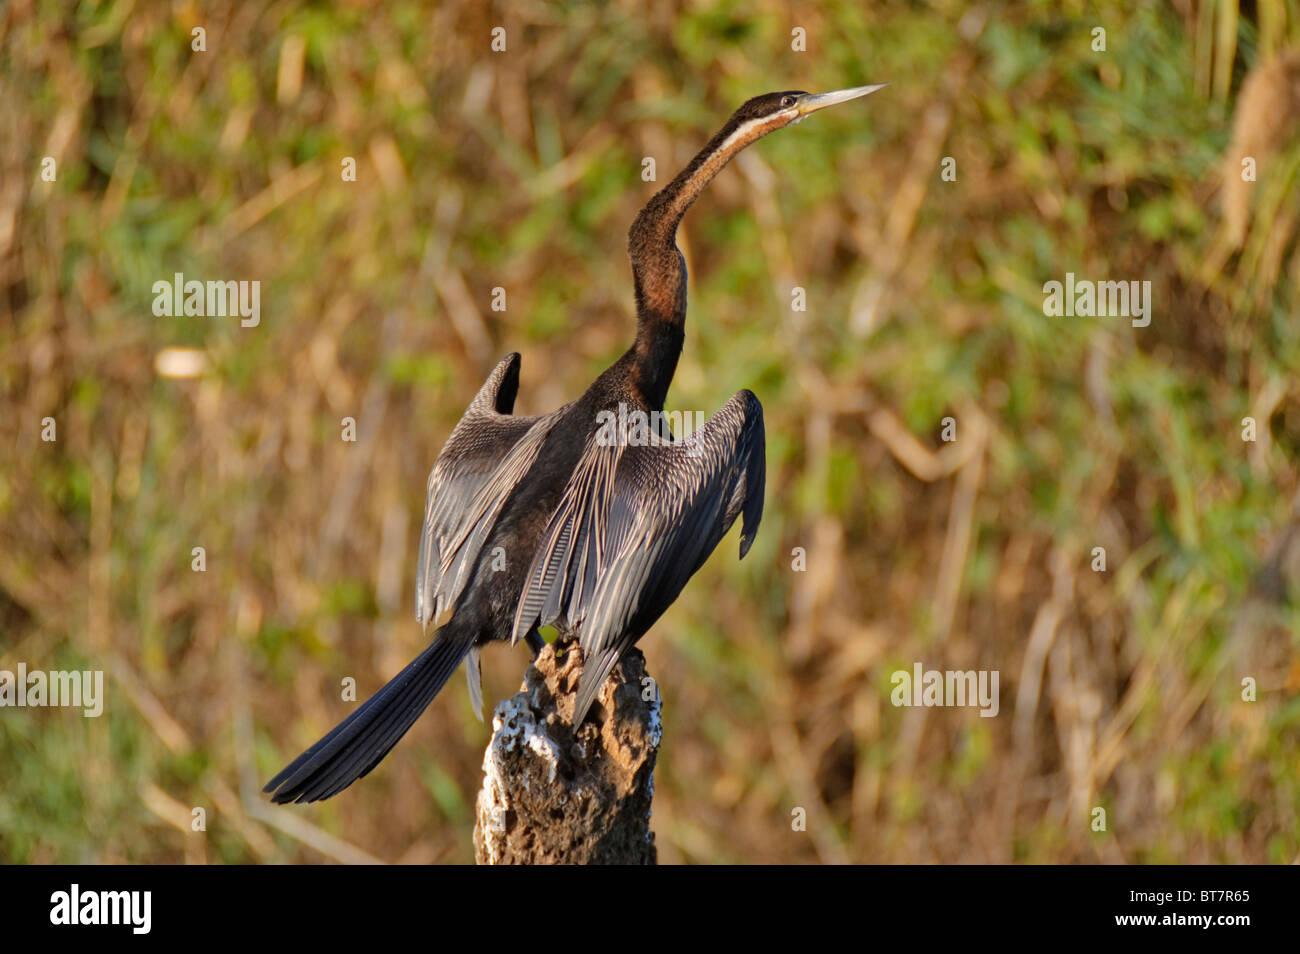 Oriental Darter or Snakebird (Anhinga melanogaster ) on the Okawango River, Botswana, Africa - Stock Image